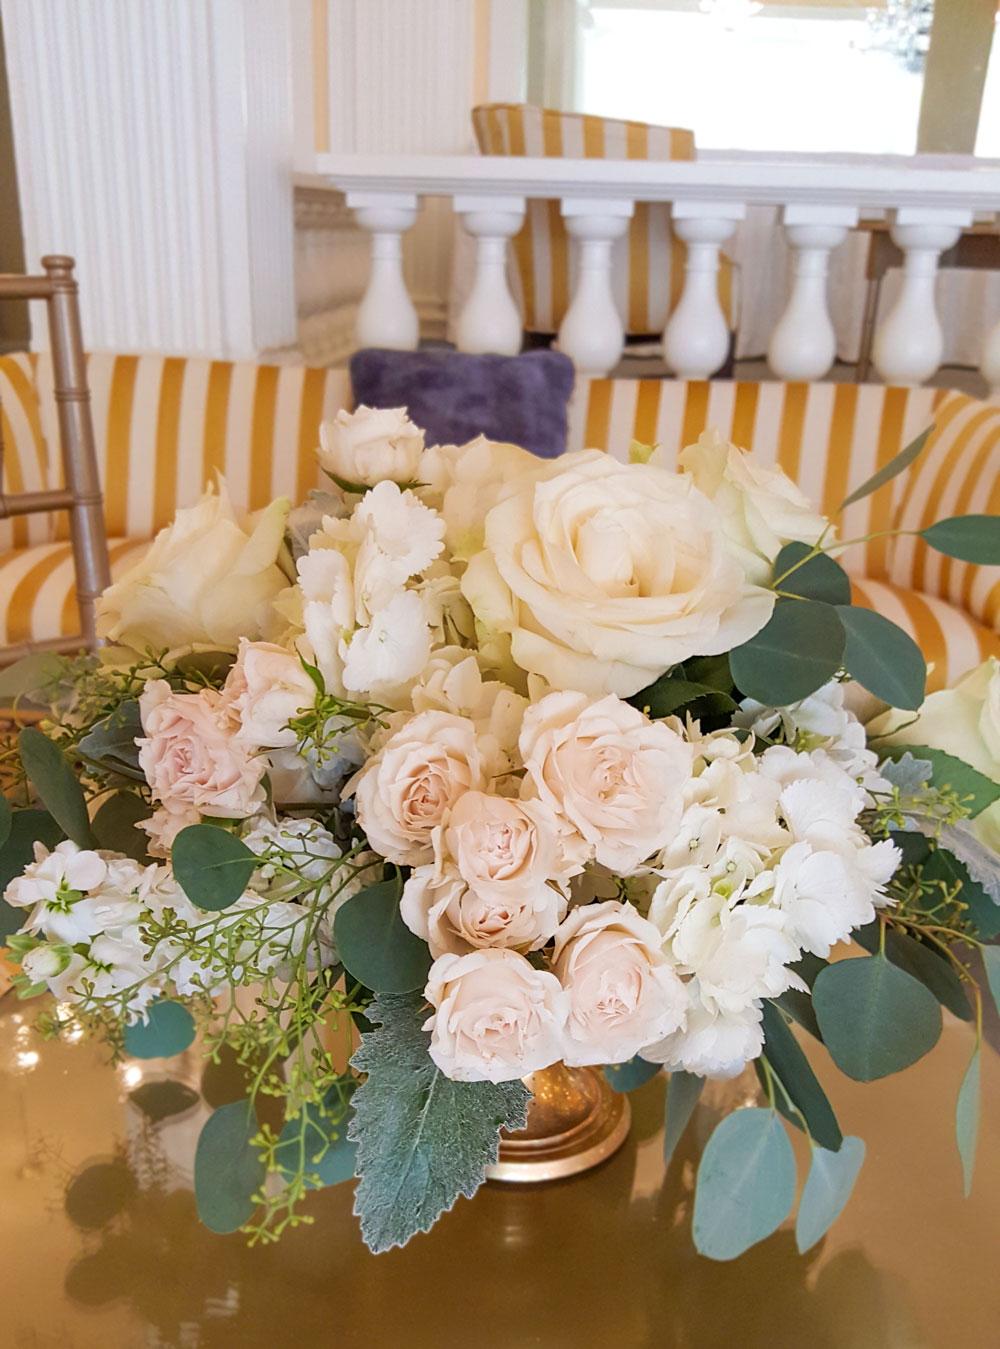 Soft Blush Cream Centerpiece - roses, hydrangea, majolkia rose sprays